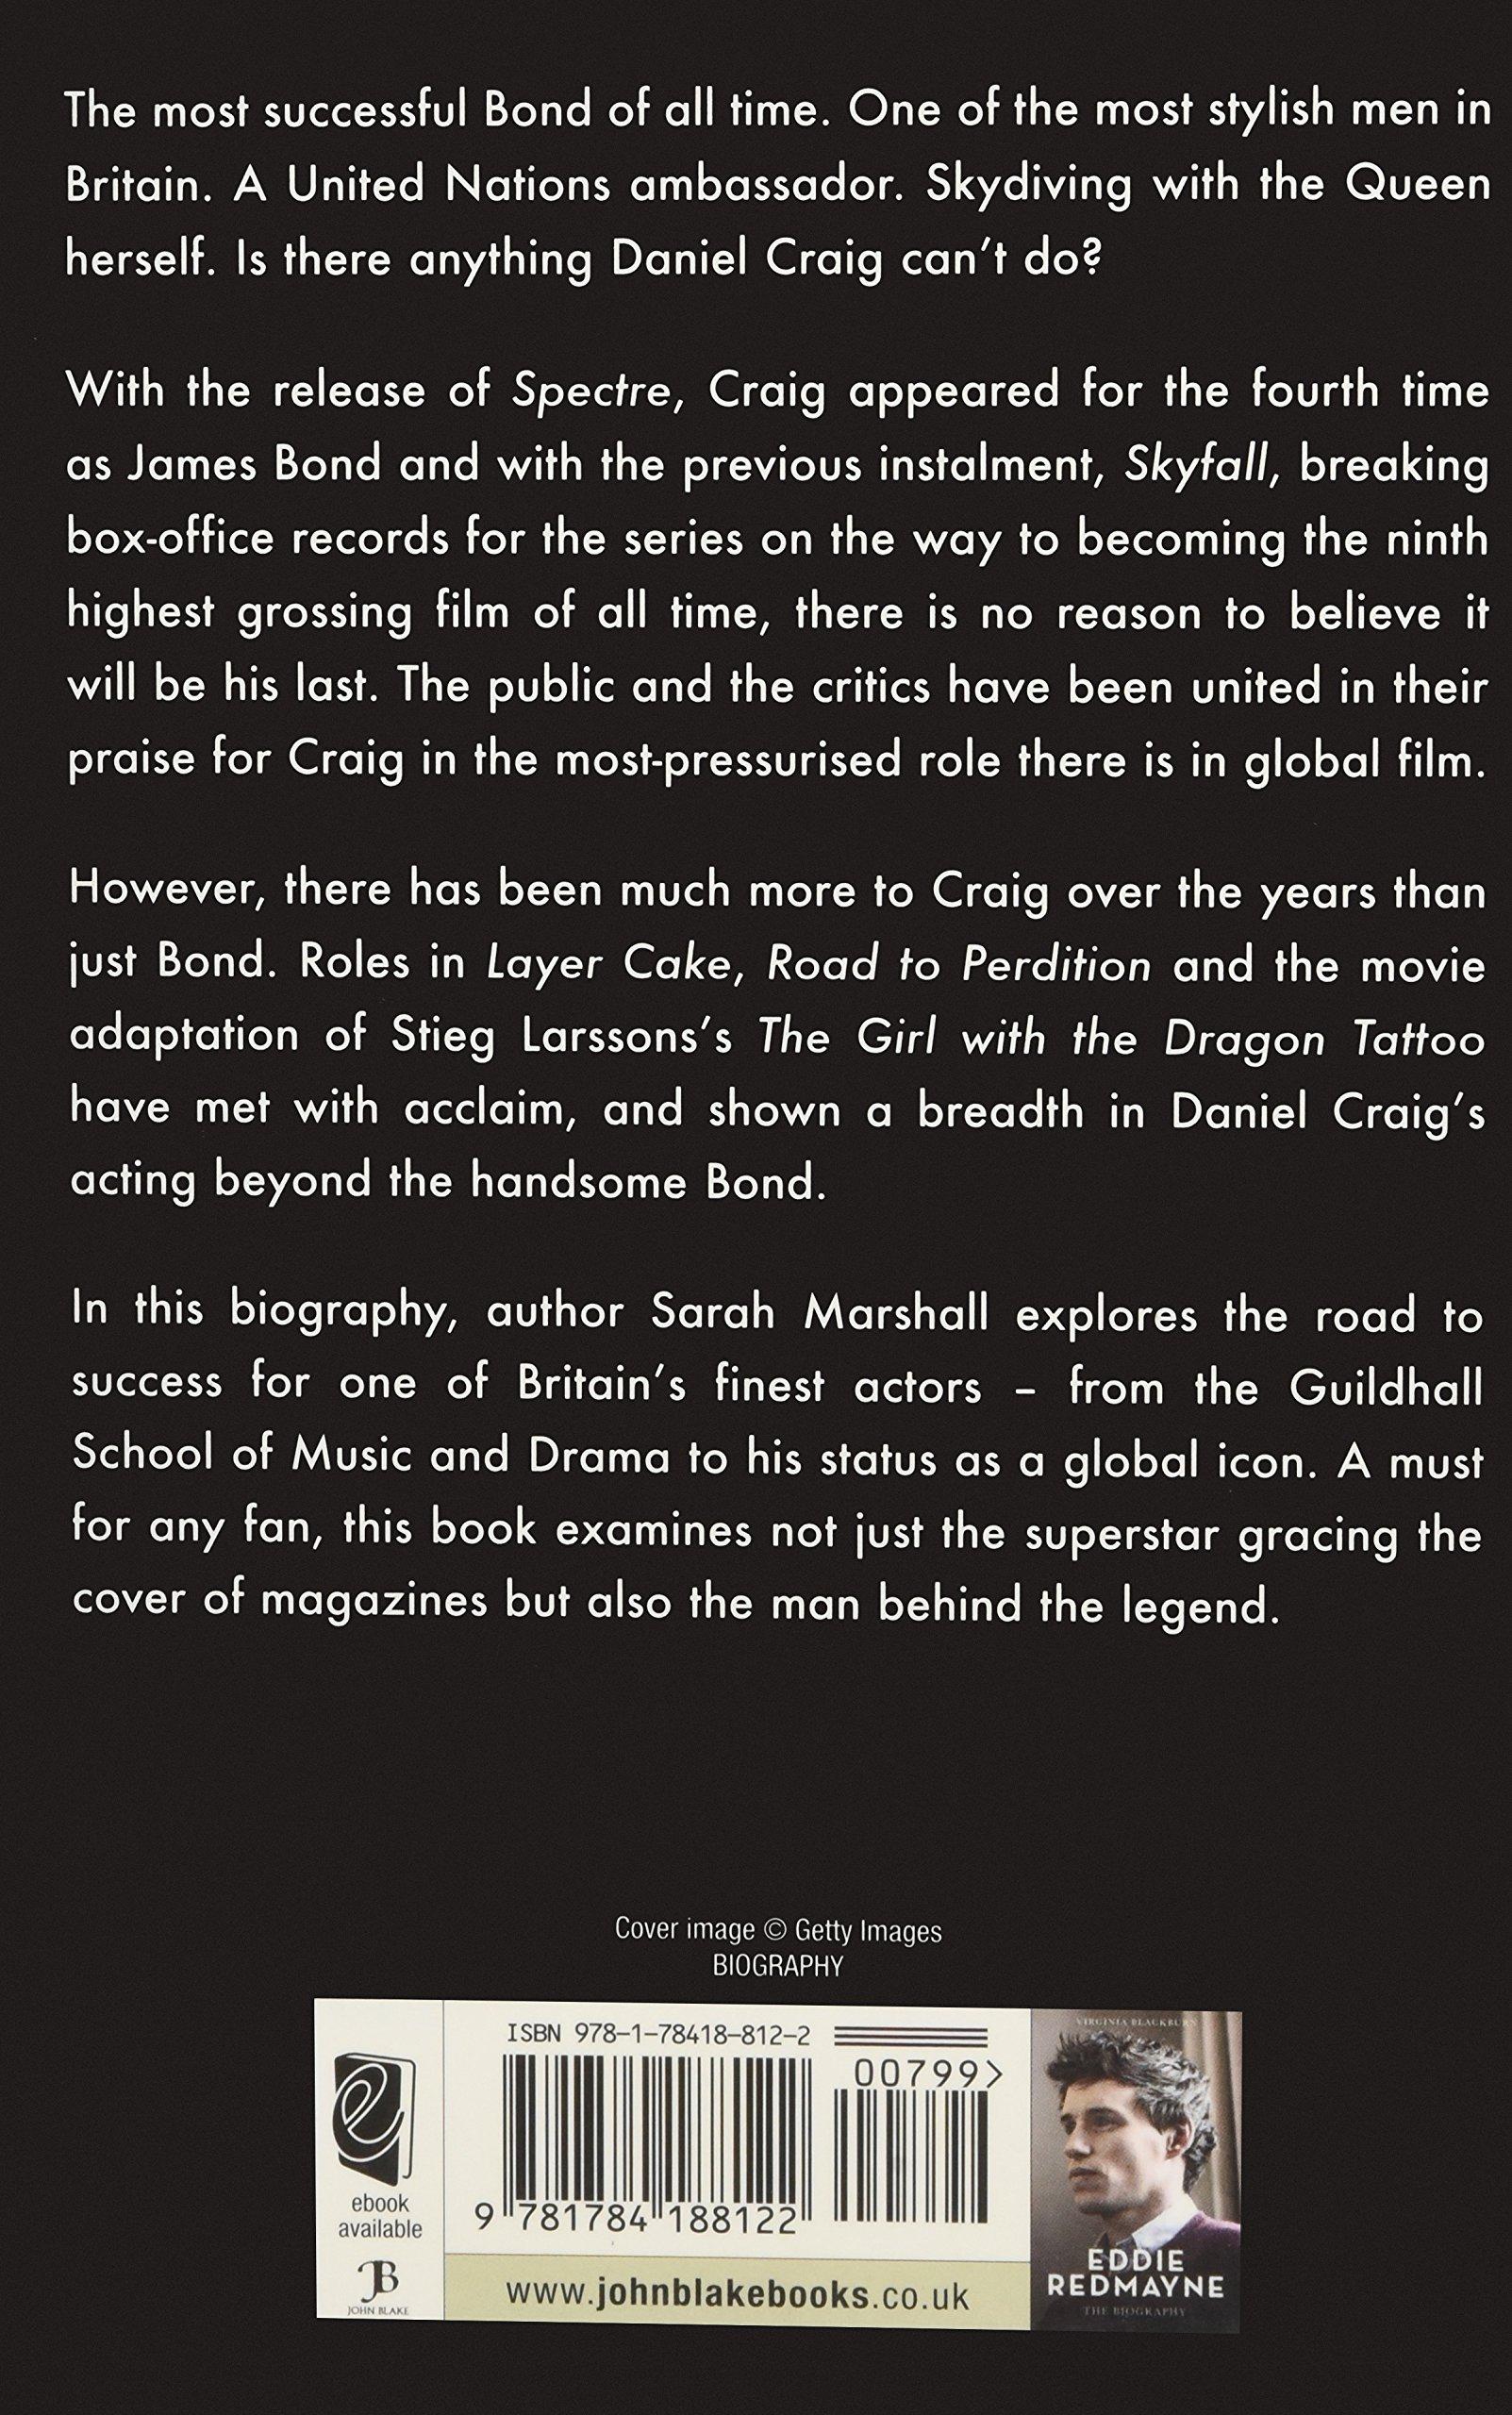 Daniel Craig The Biography Sarah Marshall Amazon